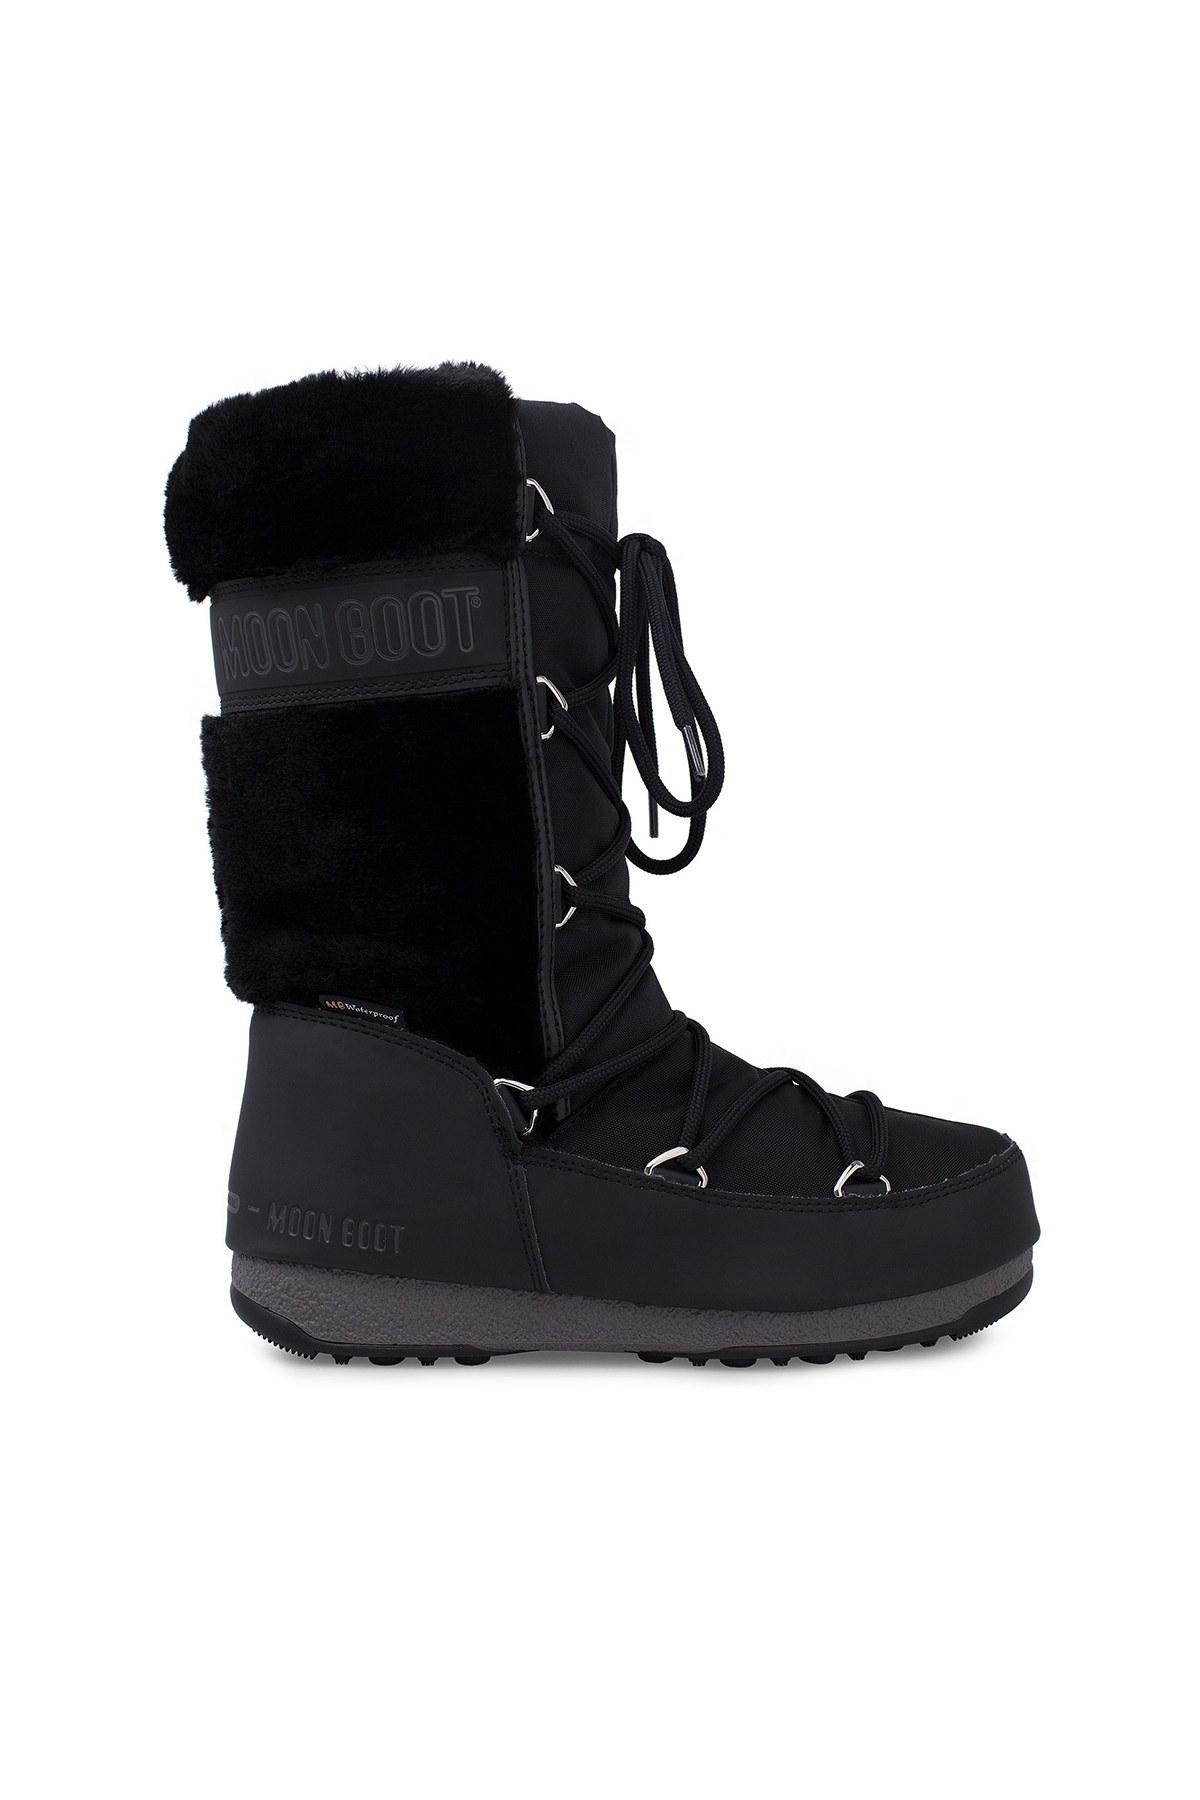 Moon Boot Bayan Bot 24009600 001 SİYAH